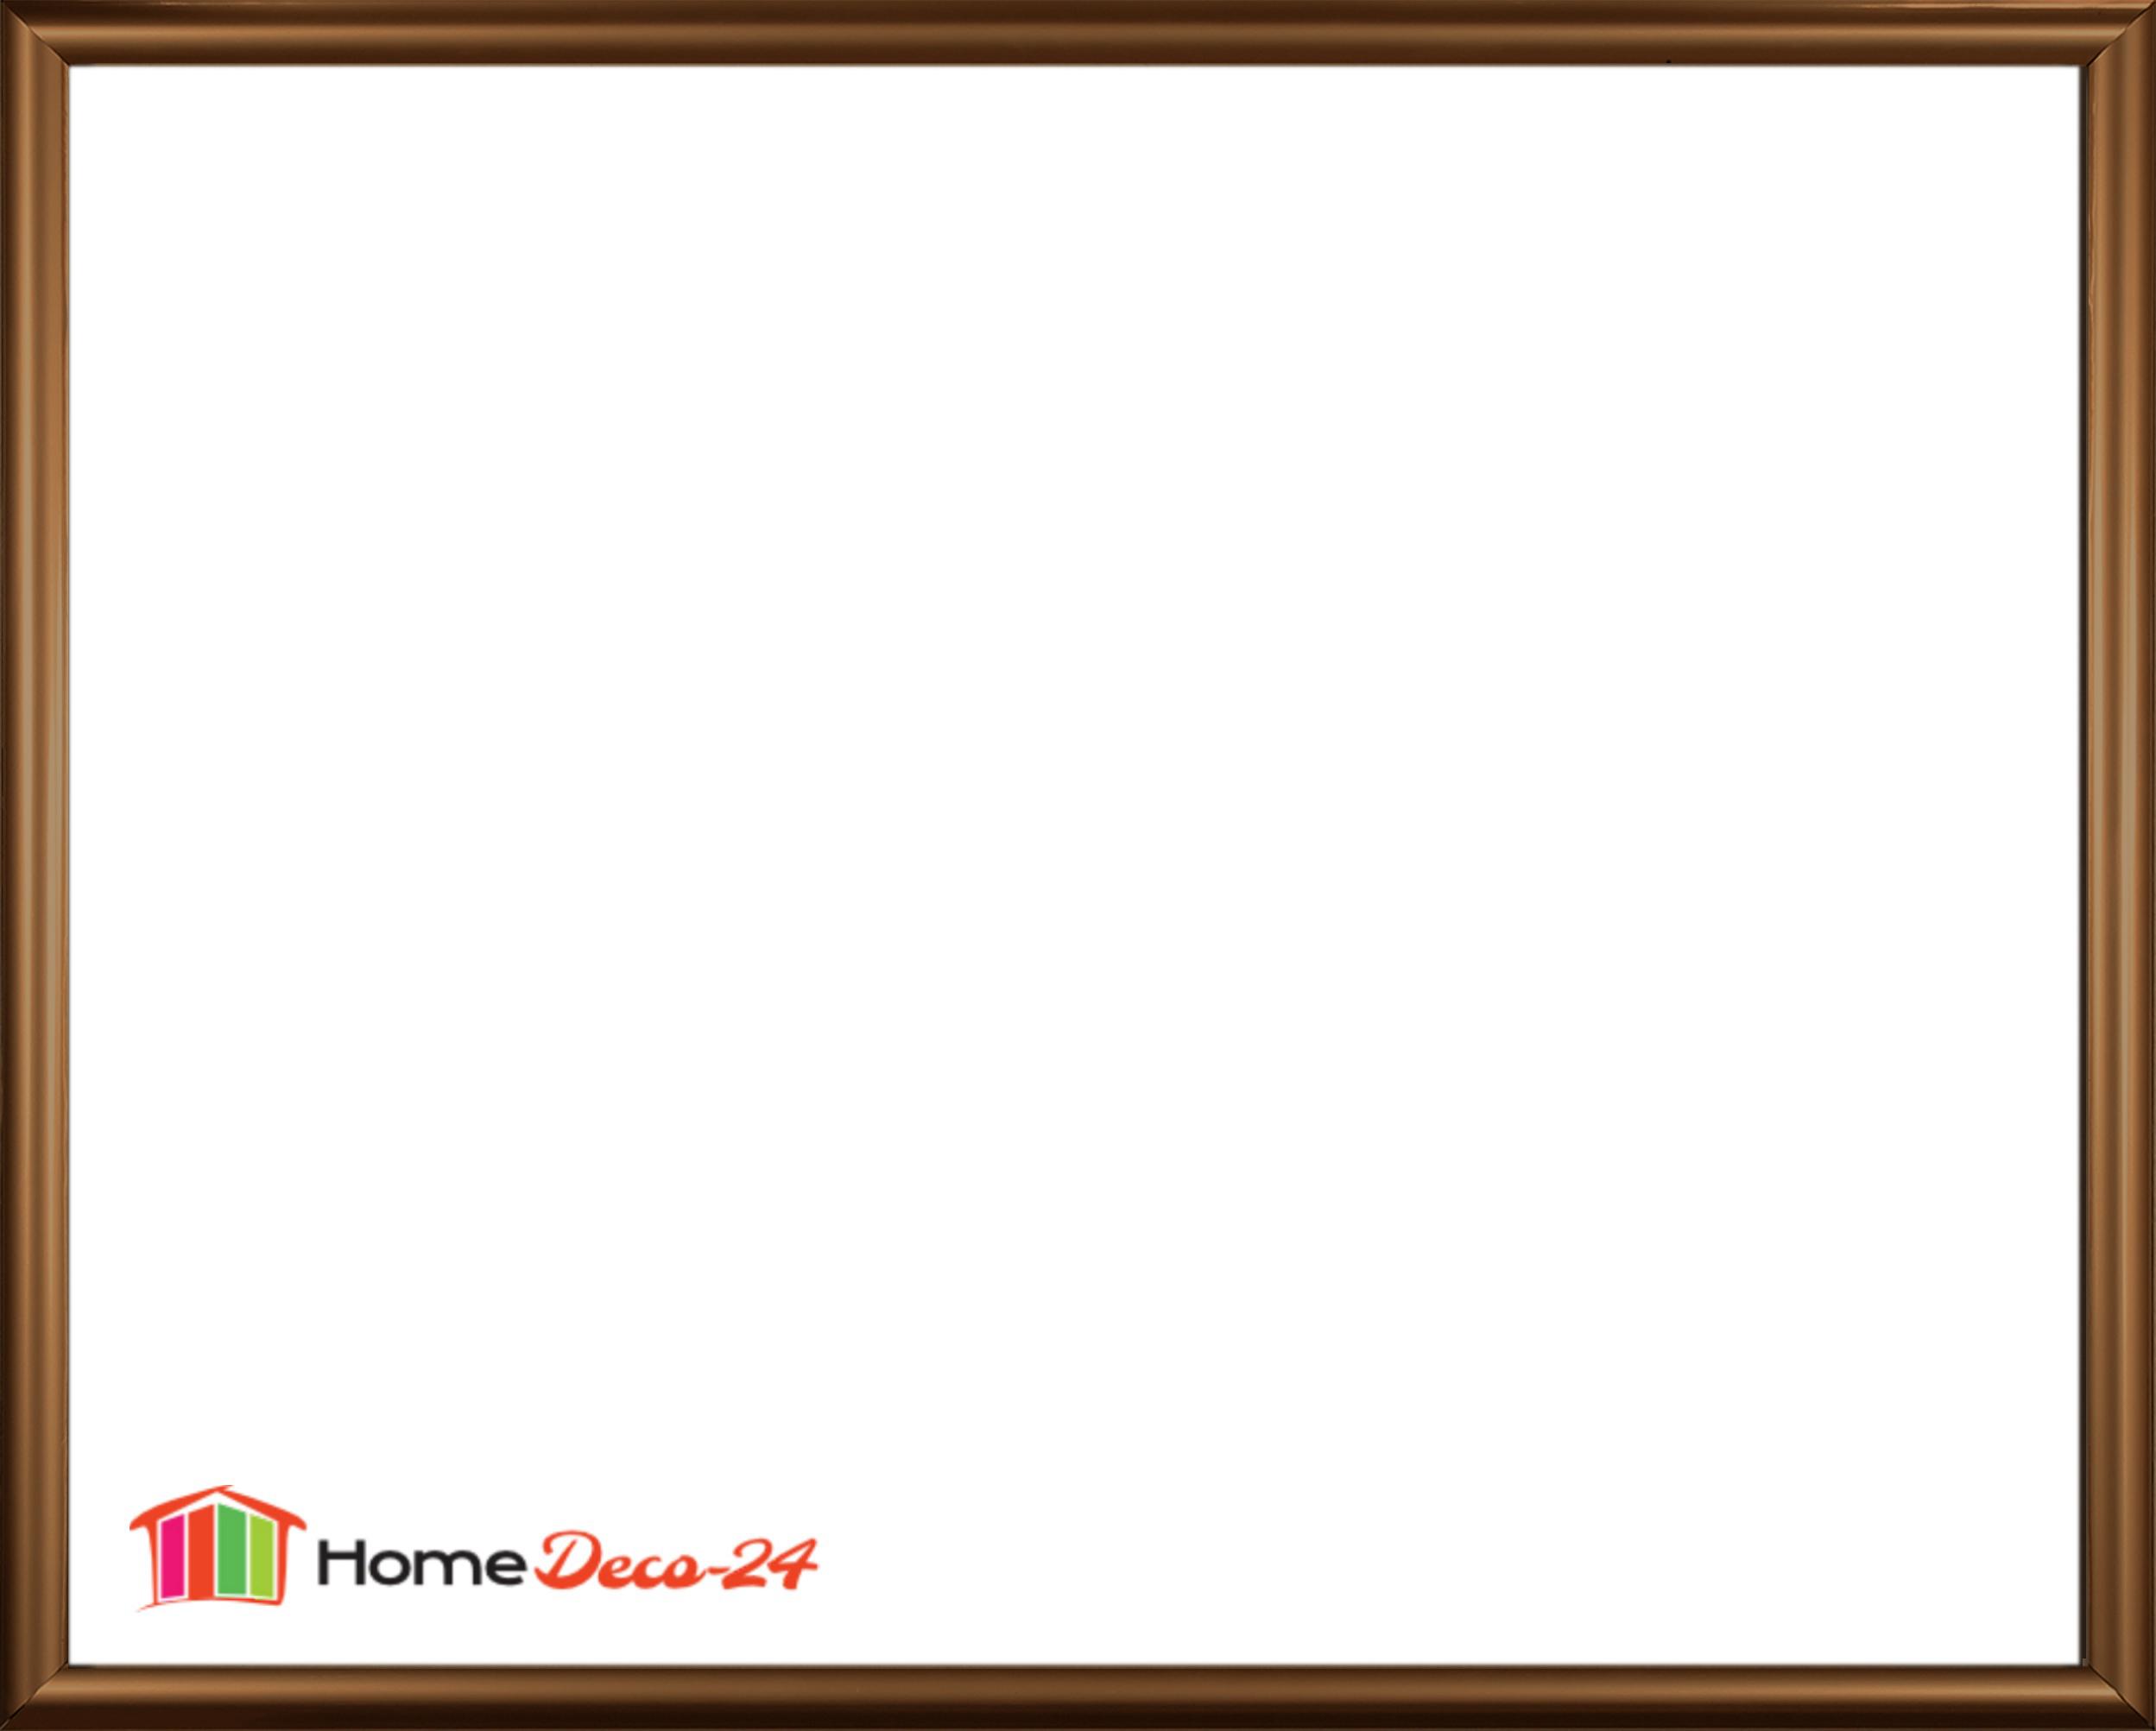 kunststoff bilderrahmen 35 x 35 cm rotterdam 35 x 35 cm farbwahl ebay. Black Bedroom Furniture Sets. Home Design Ideas